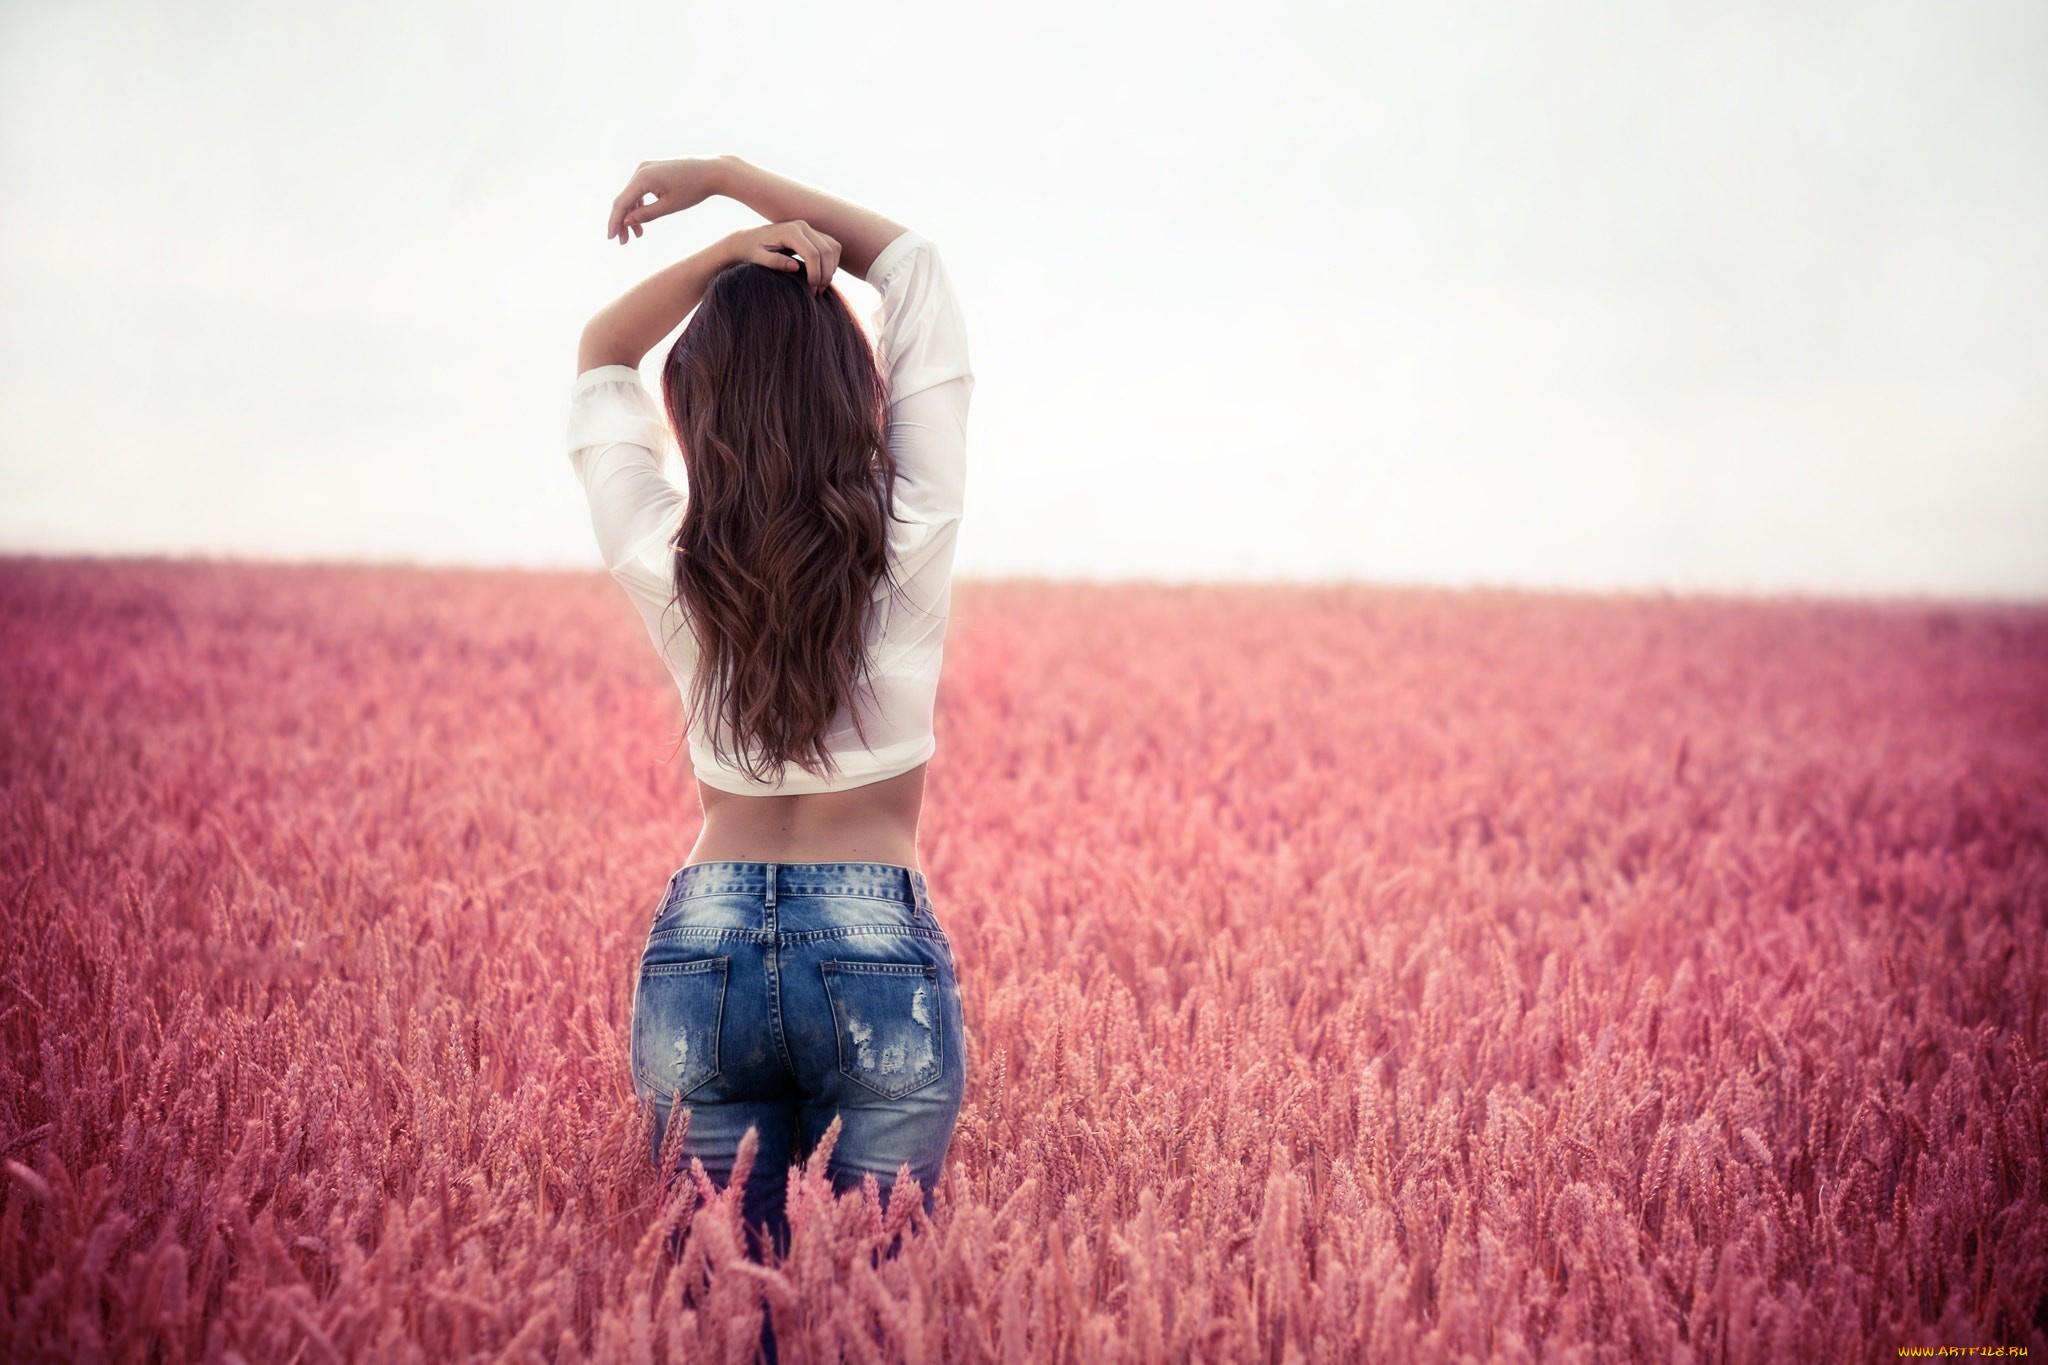 фото с девушки со спины - 5